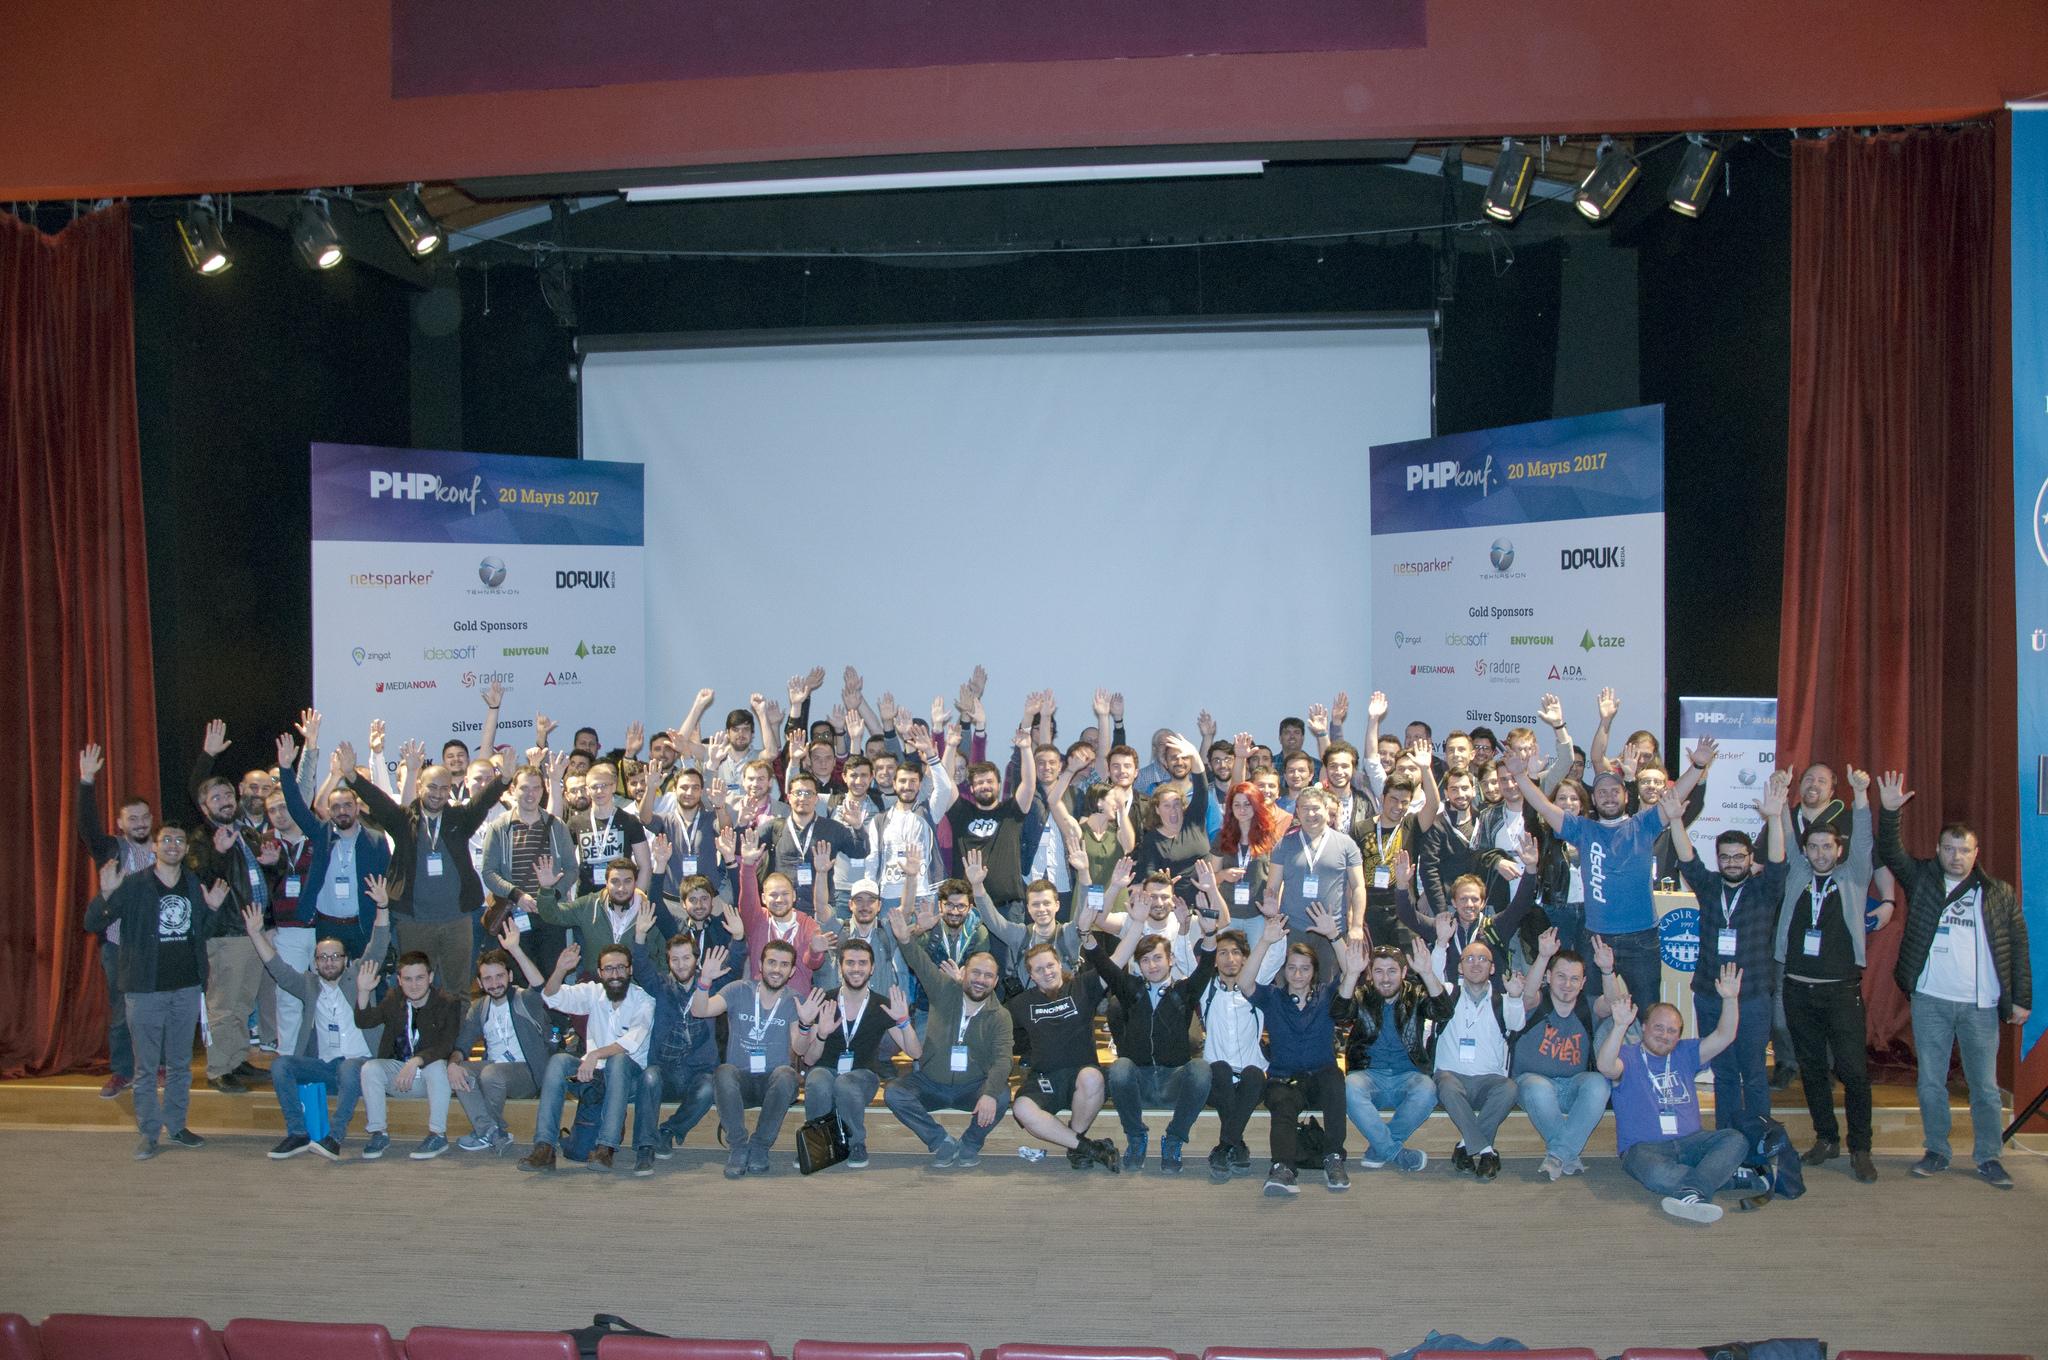 PhpKonf 2017